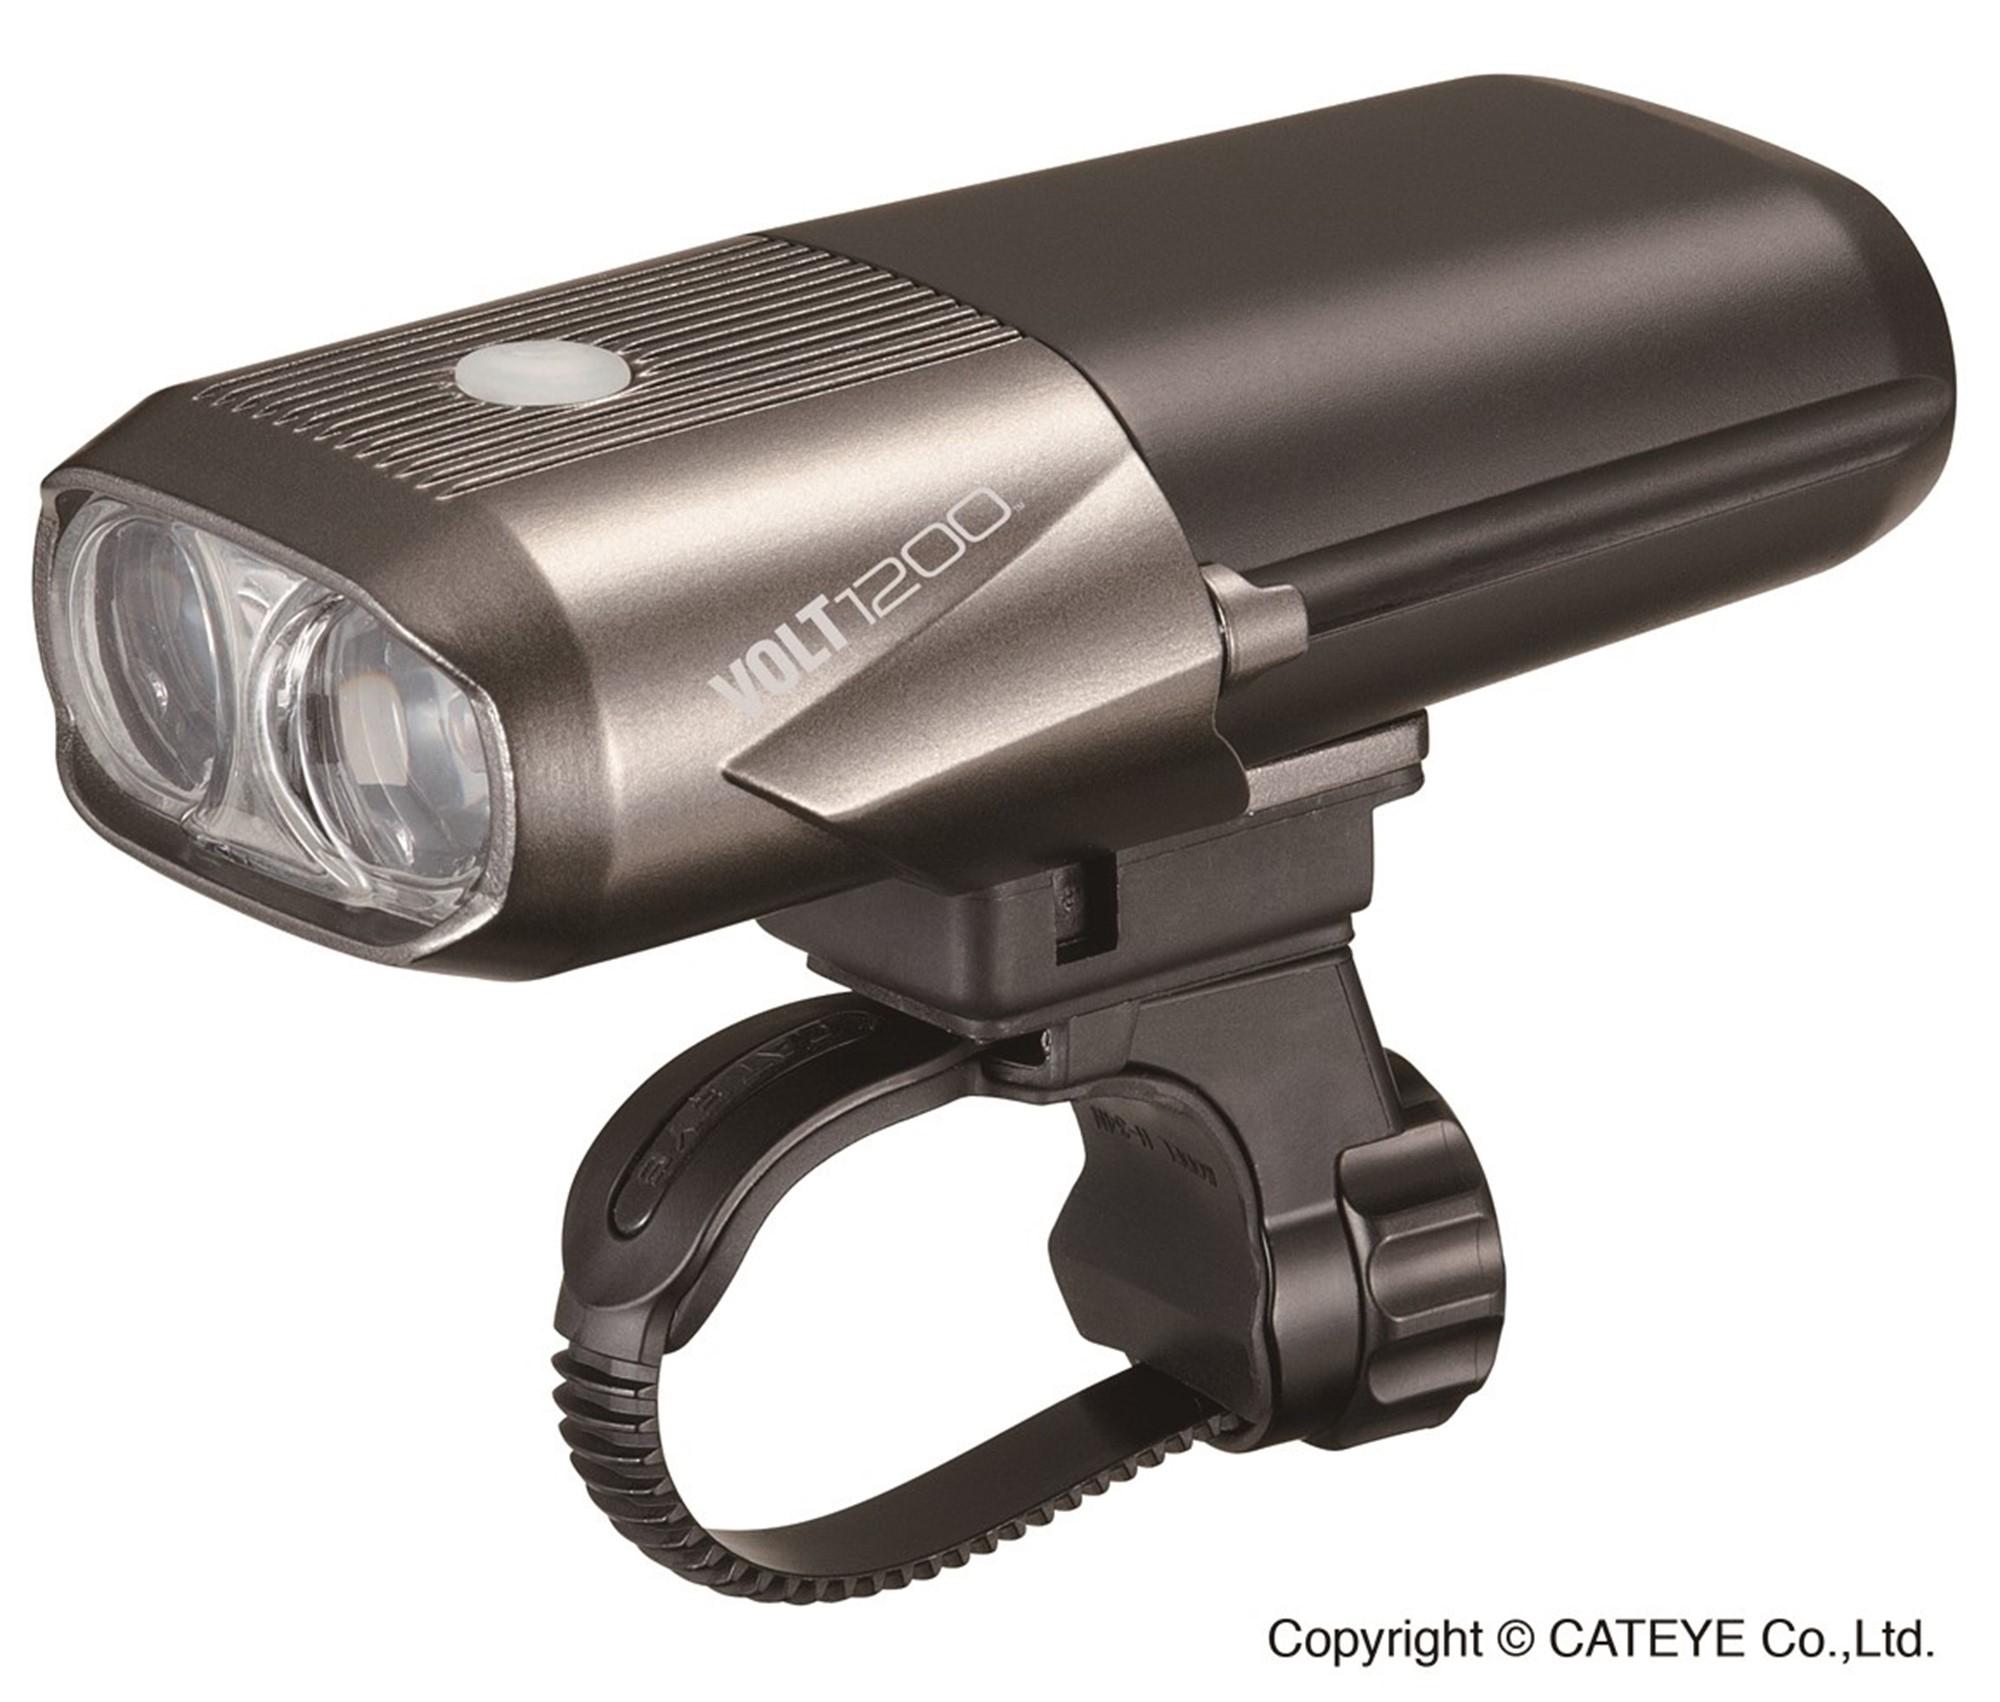 Image of Forlygte Cateye VOLT1200 HL-EL1000RC USB Genopladelig - 1200 Lumens